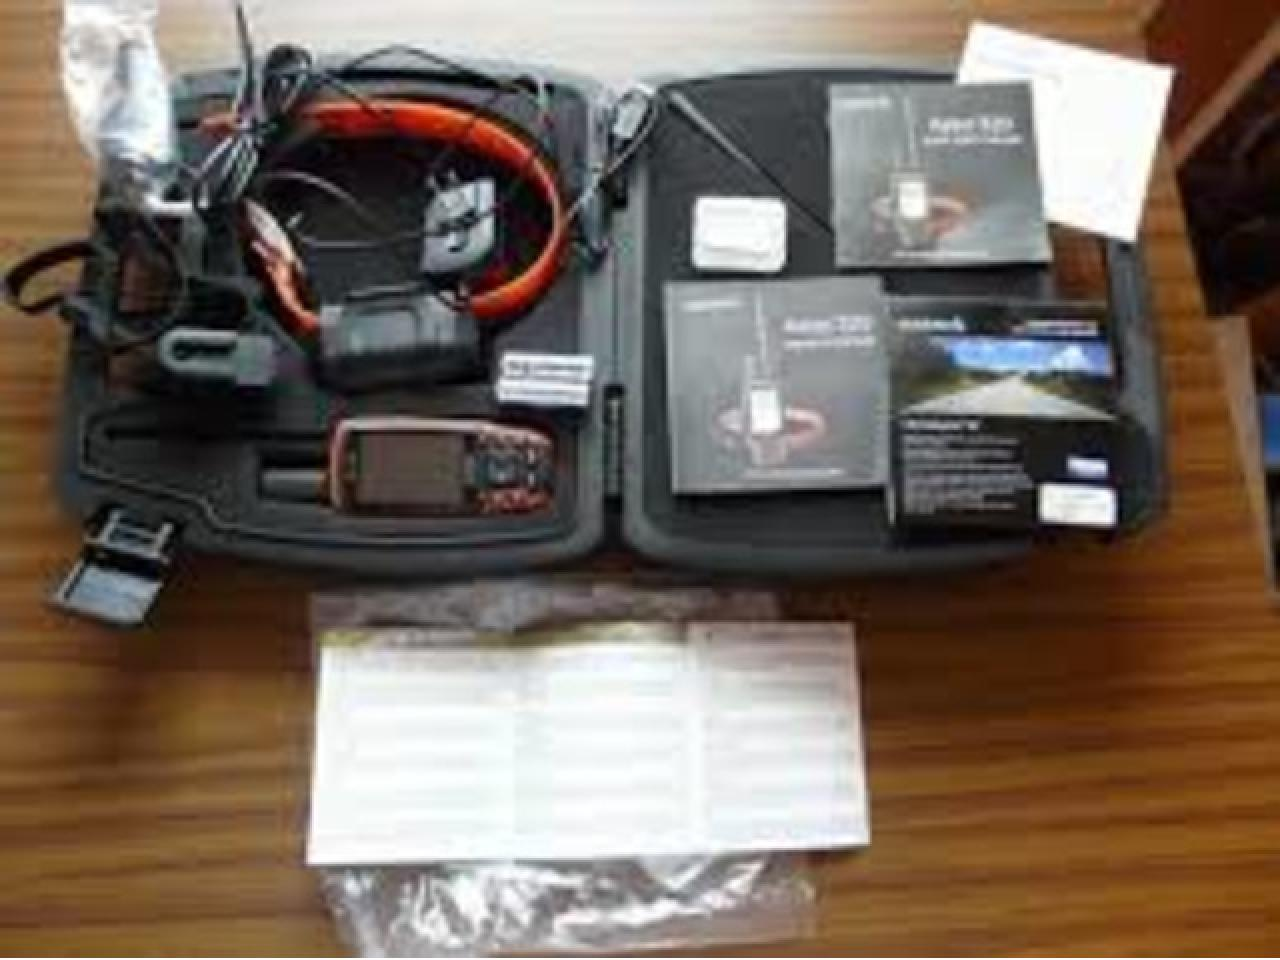 Garmin astro 320 / Alpha 100 / Sportdog Tek 2.0 Handheld с DC30.DC40 DC50 TT15 Ошейники ETC. - 1